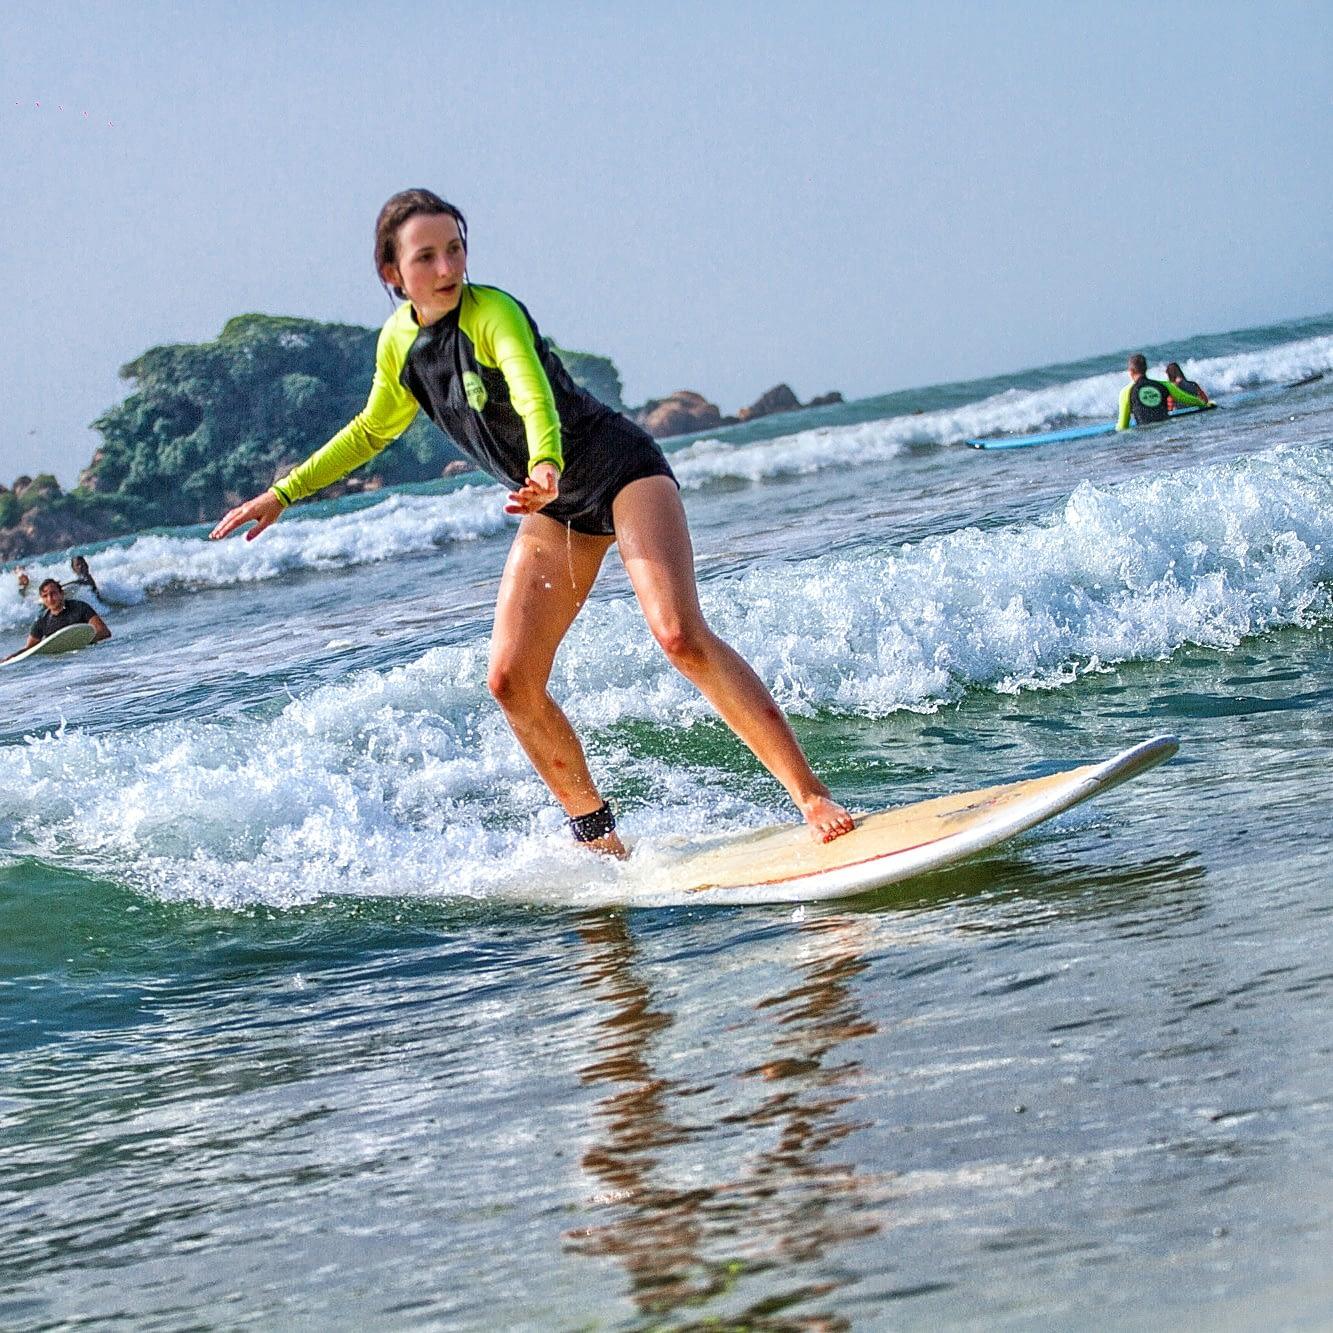 SURFING WELIGAMA SRILANKA